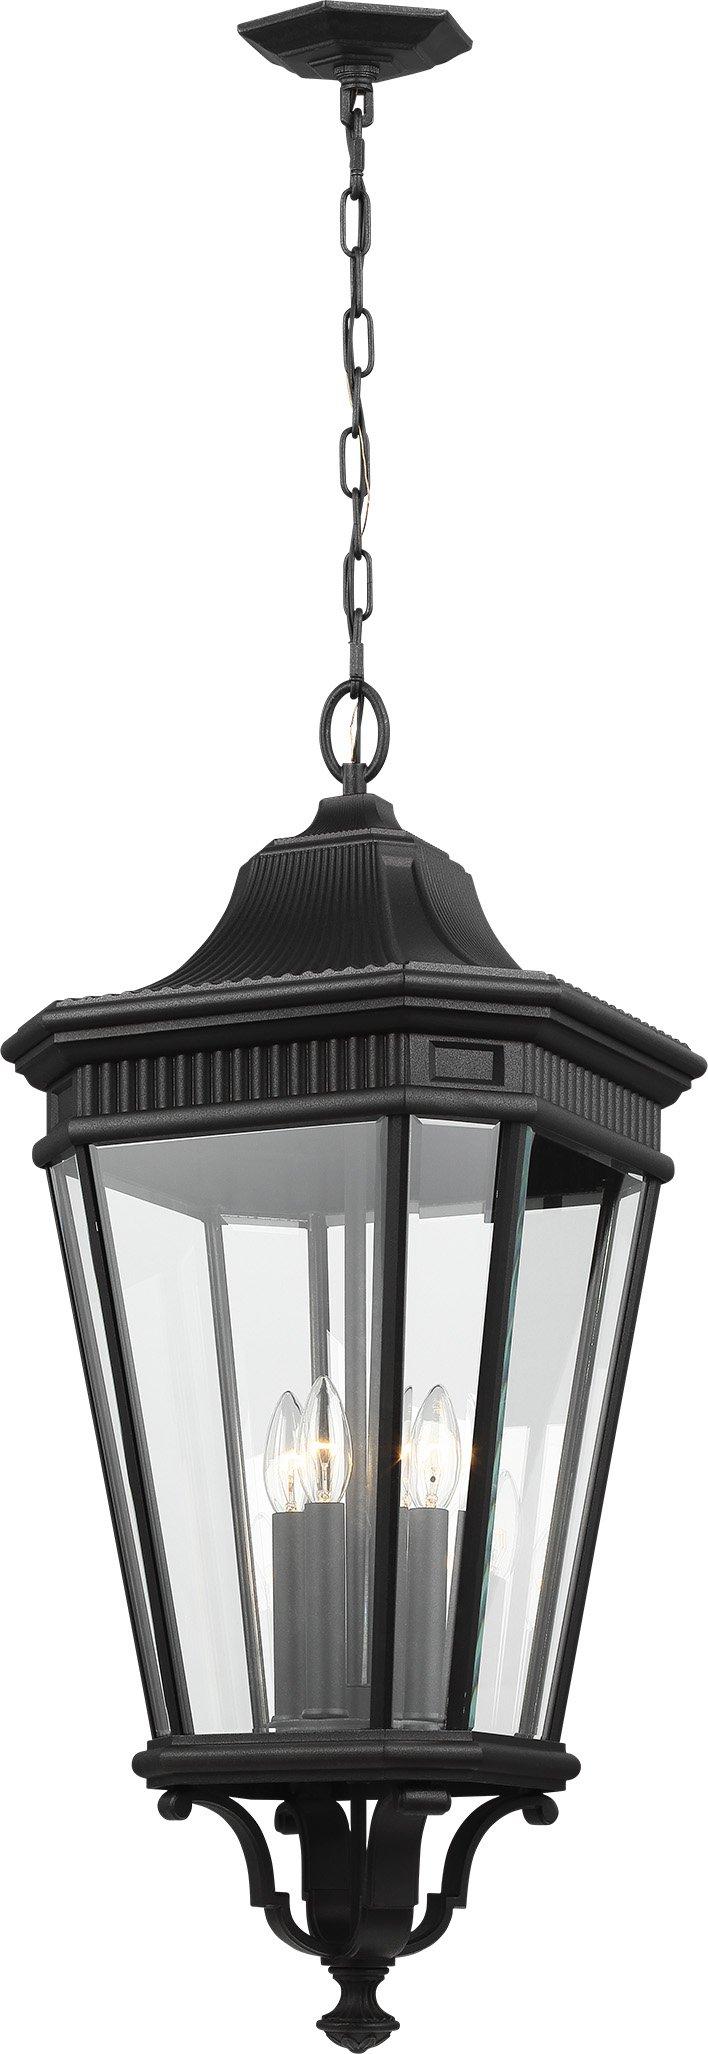 Feiss OL5414BK Cotswold Lane Outdoor Lighting Pendant Lantern, Black, 4-Light (14''W x 31''H) 240watts